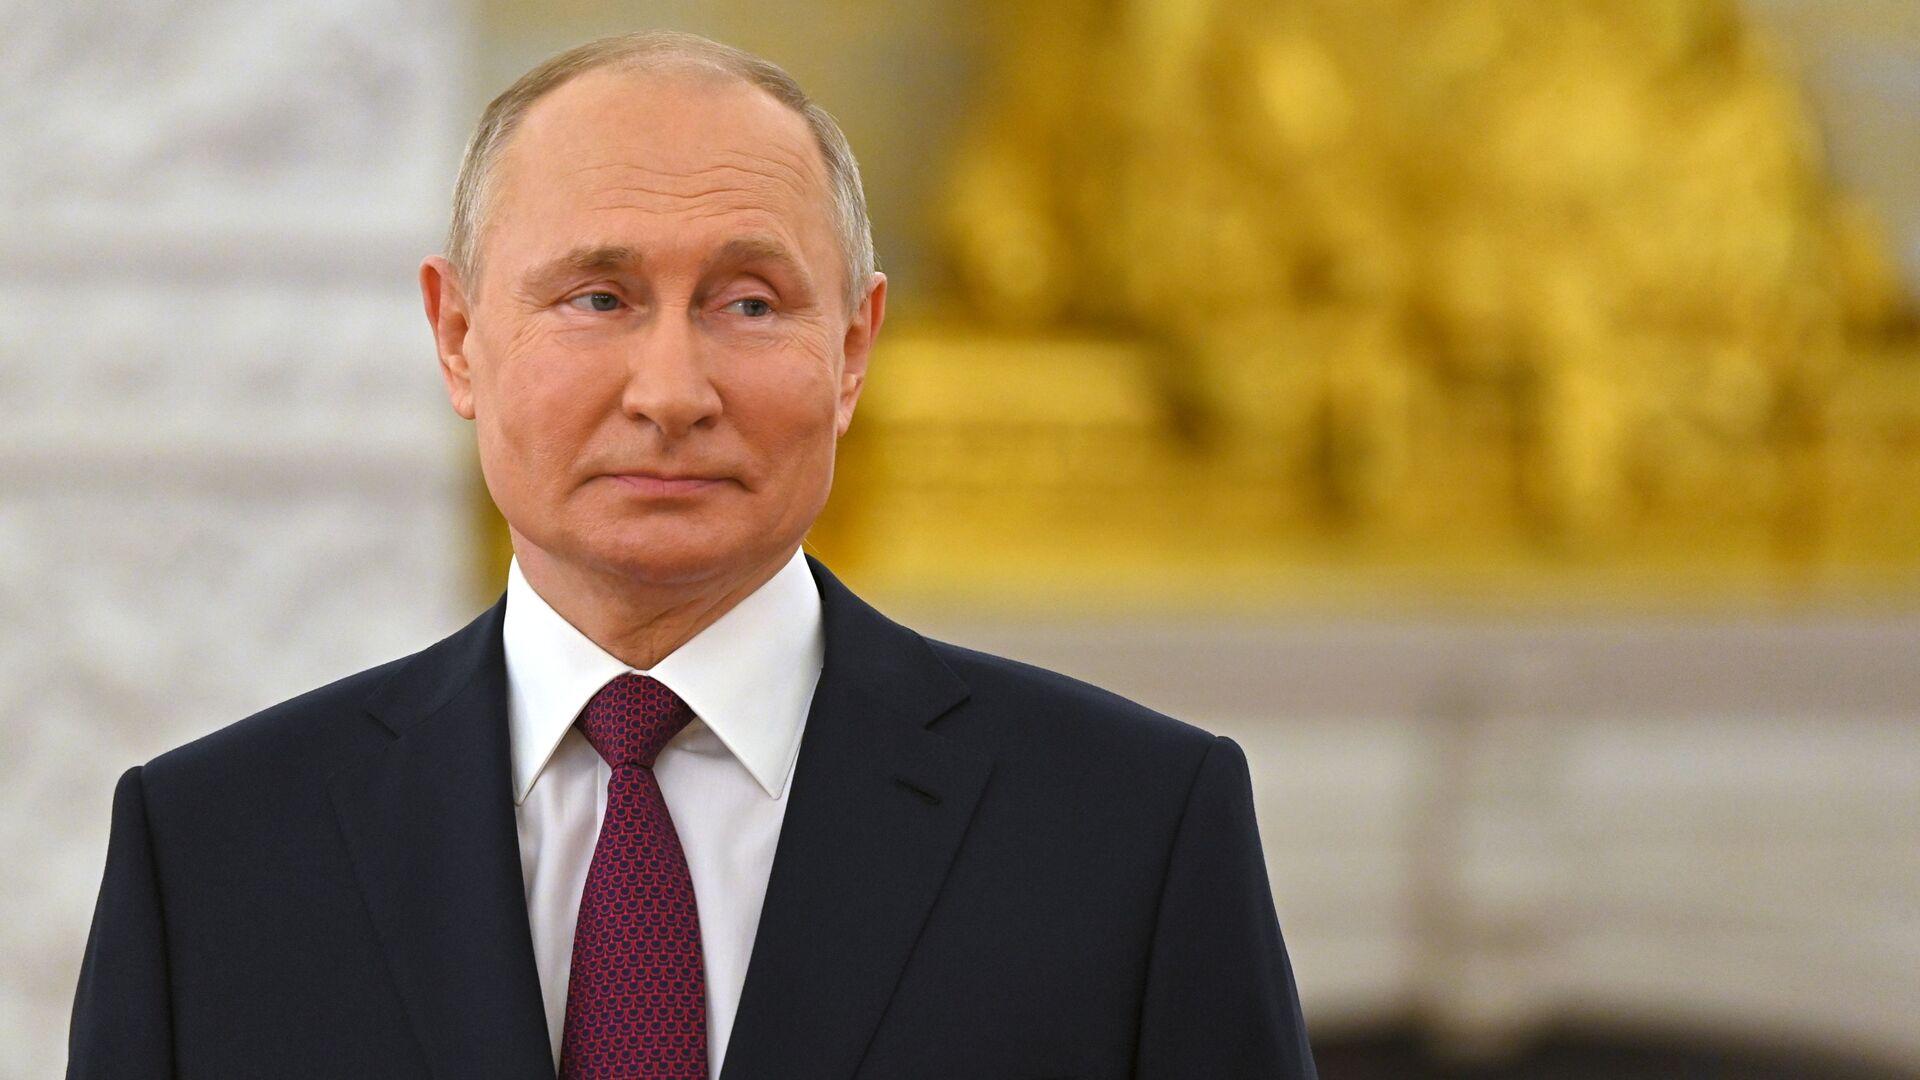 Prezydent Rosji Władimir Putin. - Sputnik Polska, 1920, 14.10.2021